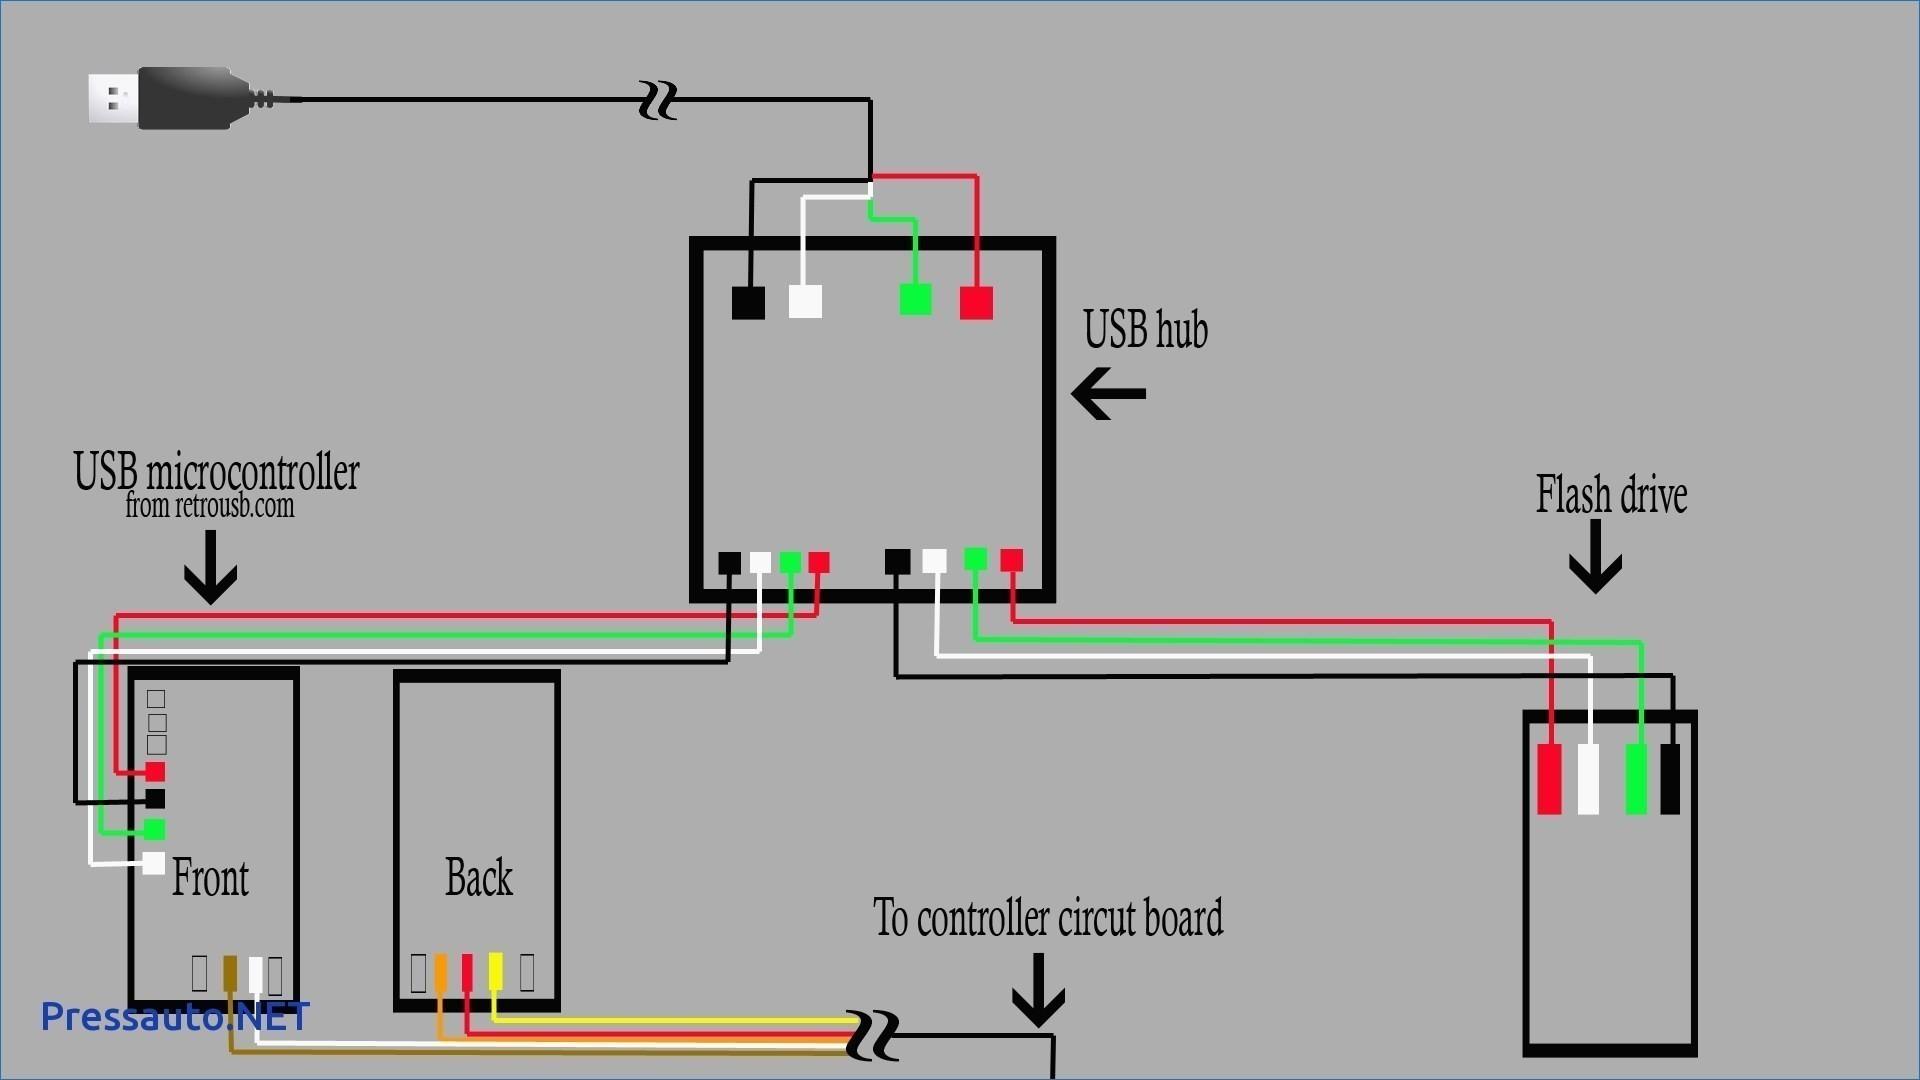 rca power wiring diagram data diagram schematic rca electrical wiring diagrams just wiring diagram rca power